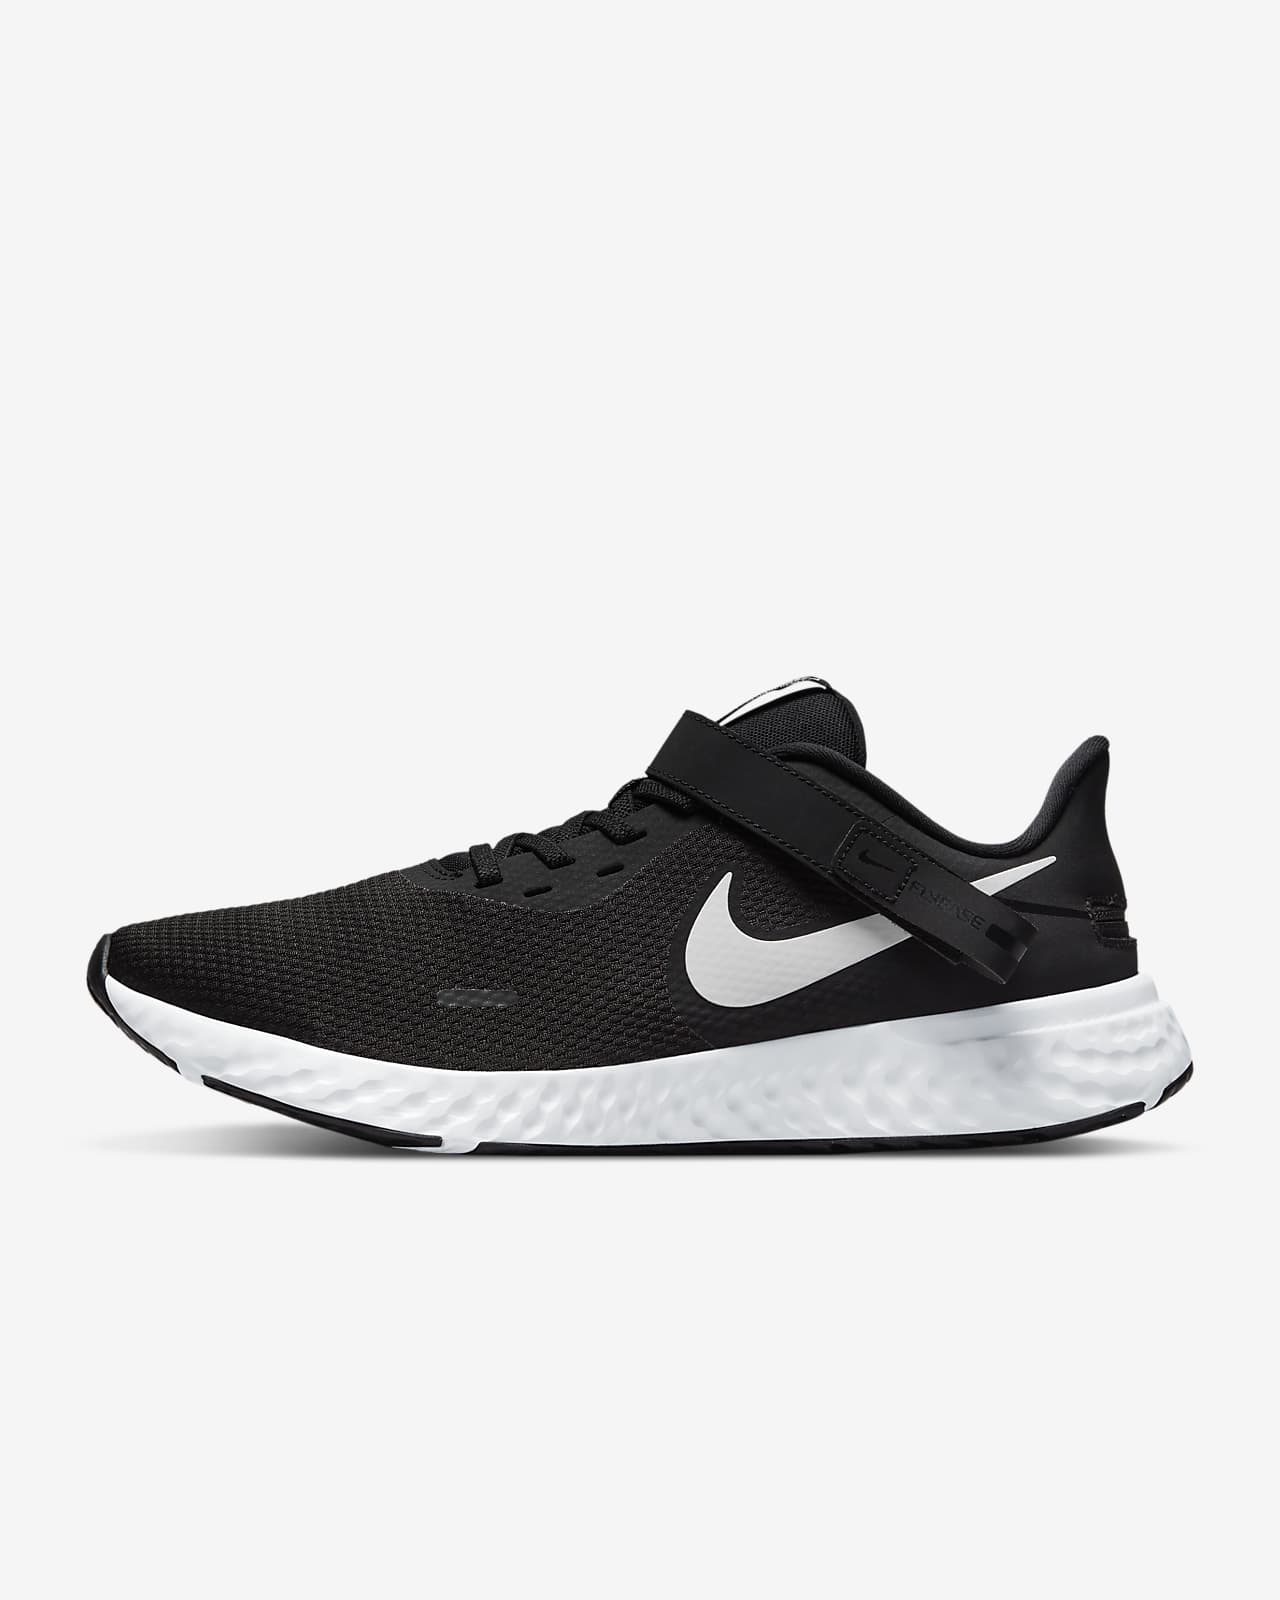 Chaussure de running Nike Revolution 5 FlyEase pour Homme